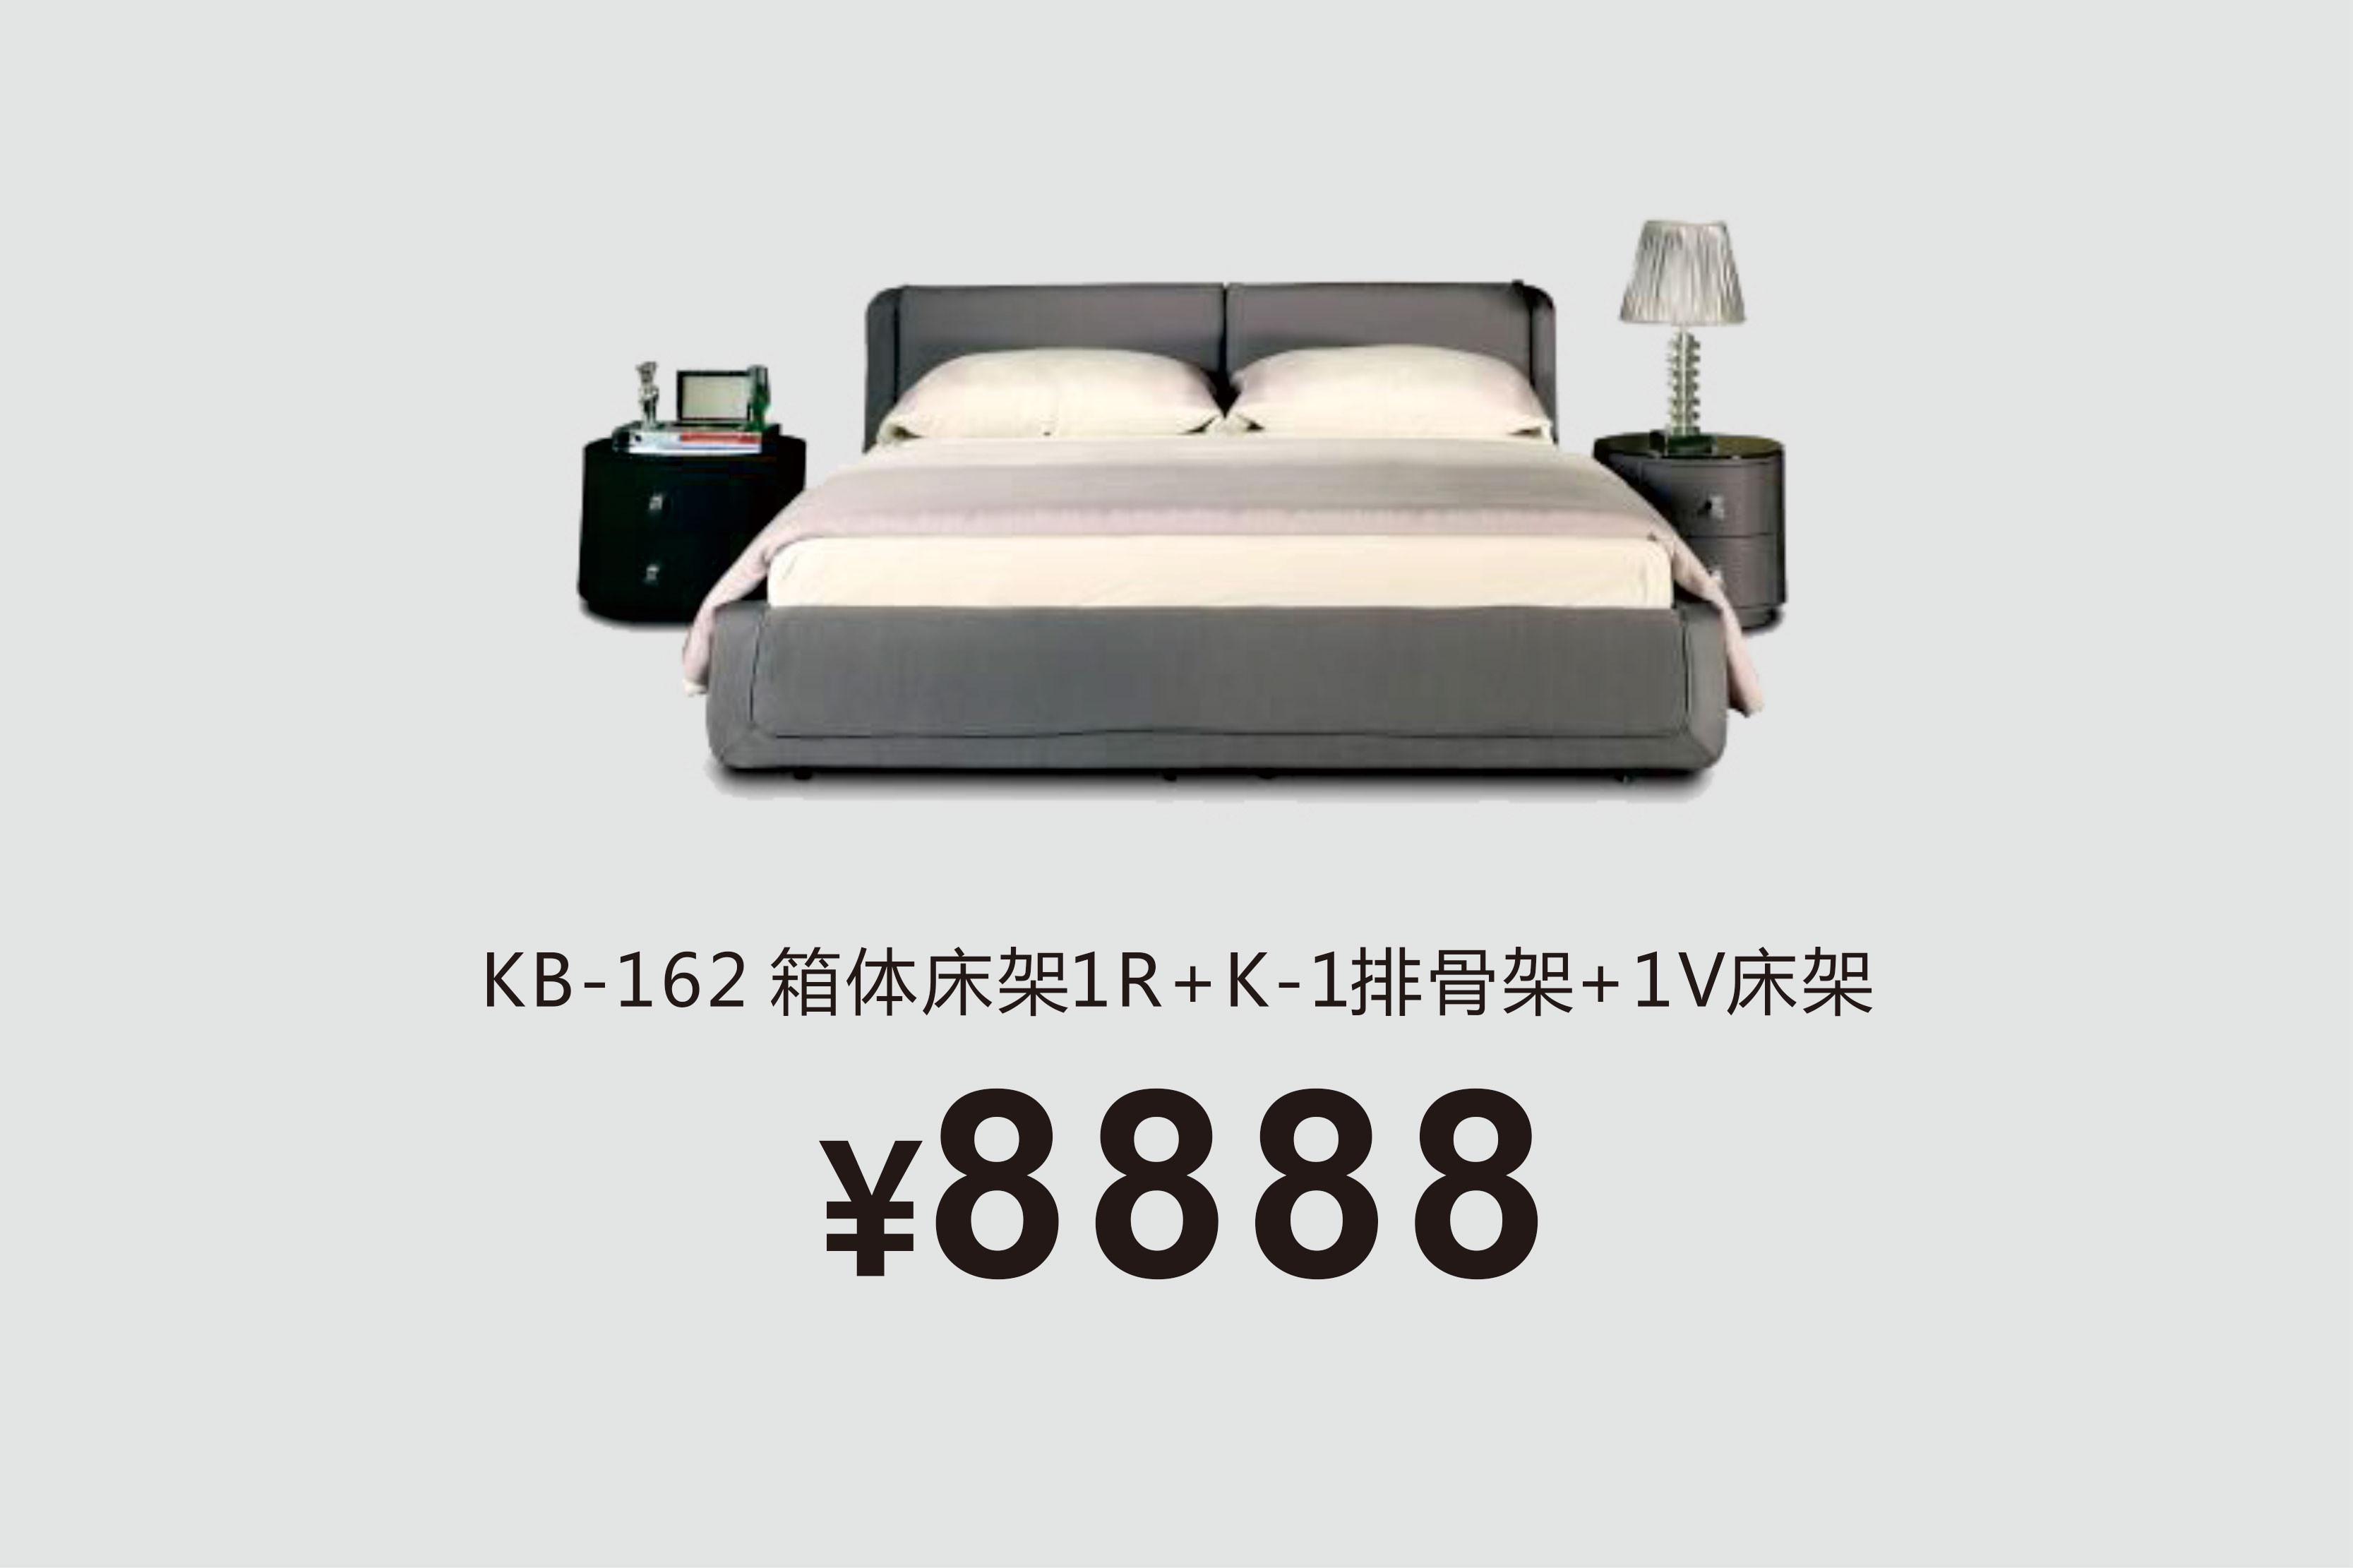 KB-162箱体床架1R+K-1排骨架+1V床垫